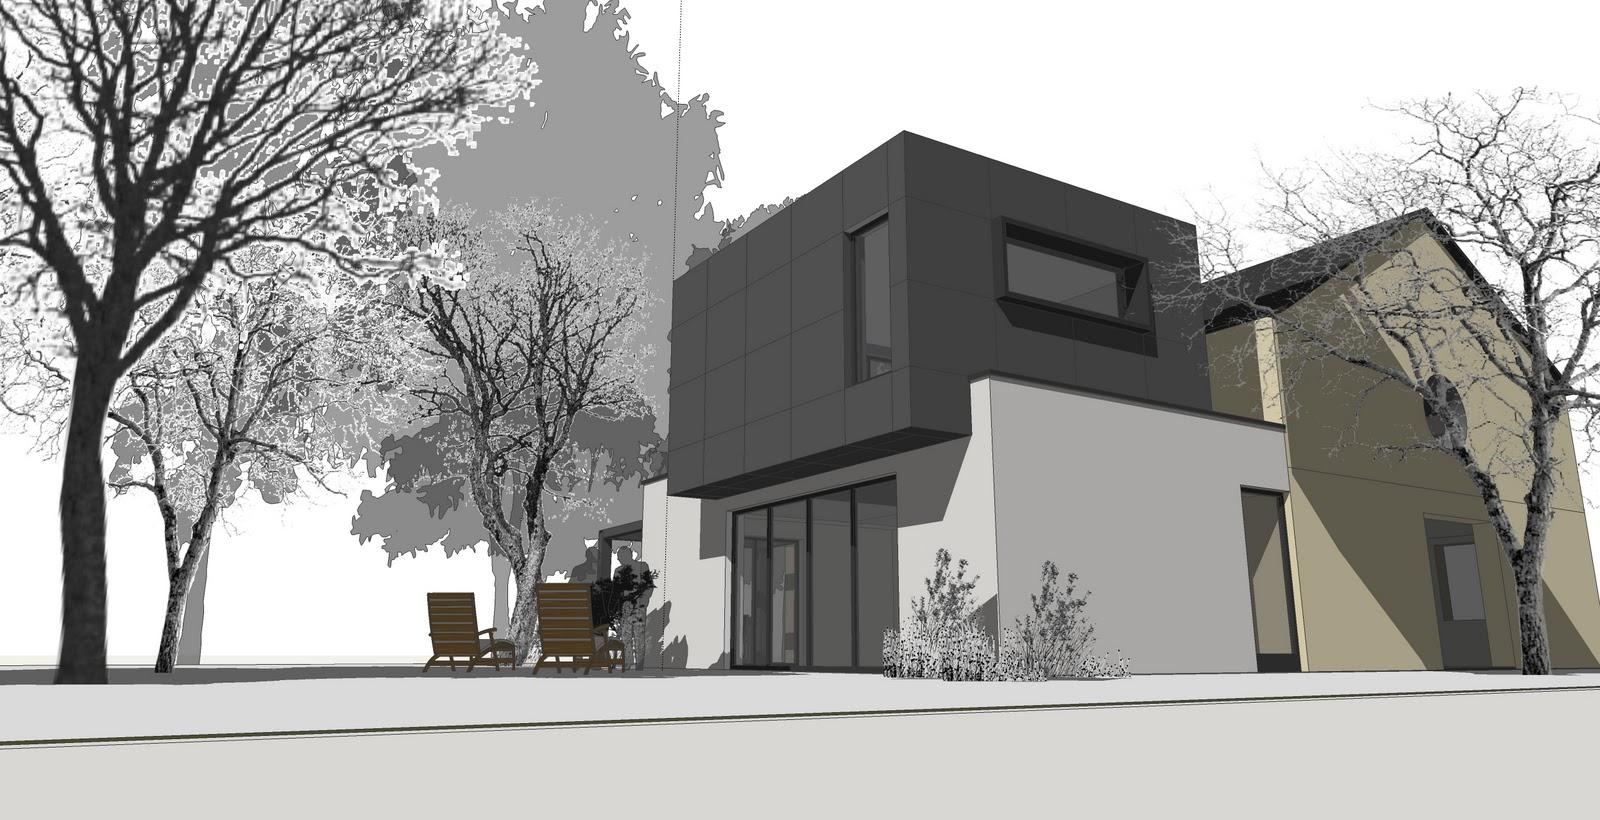 Ac architecture annexe maison etalle for Annexe maison